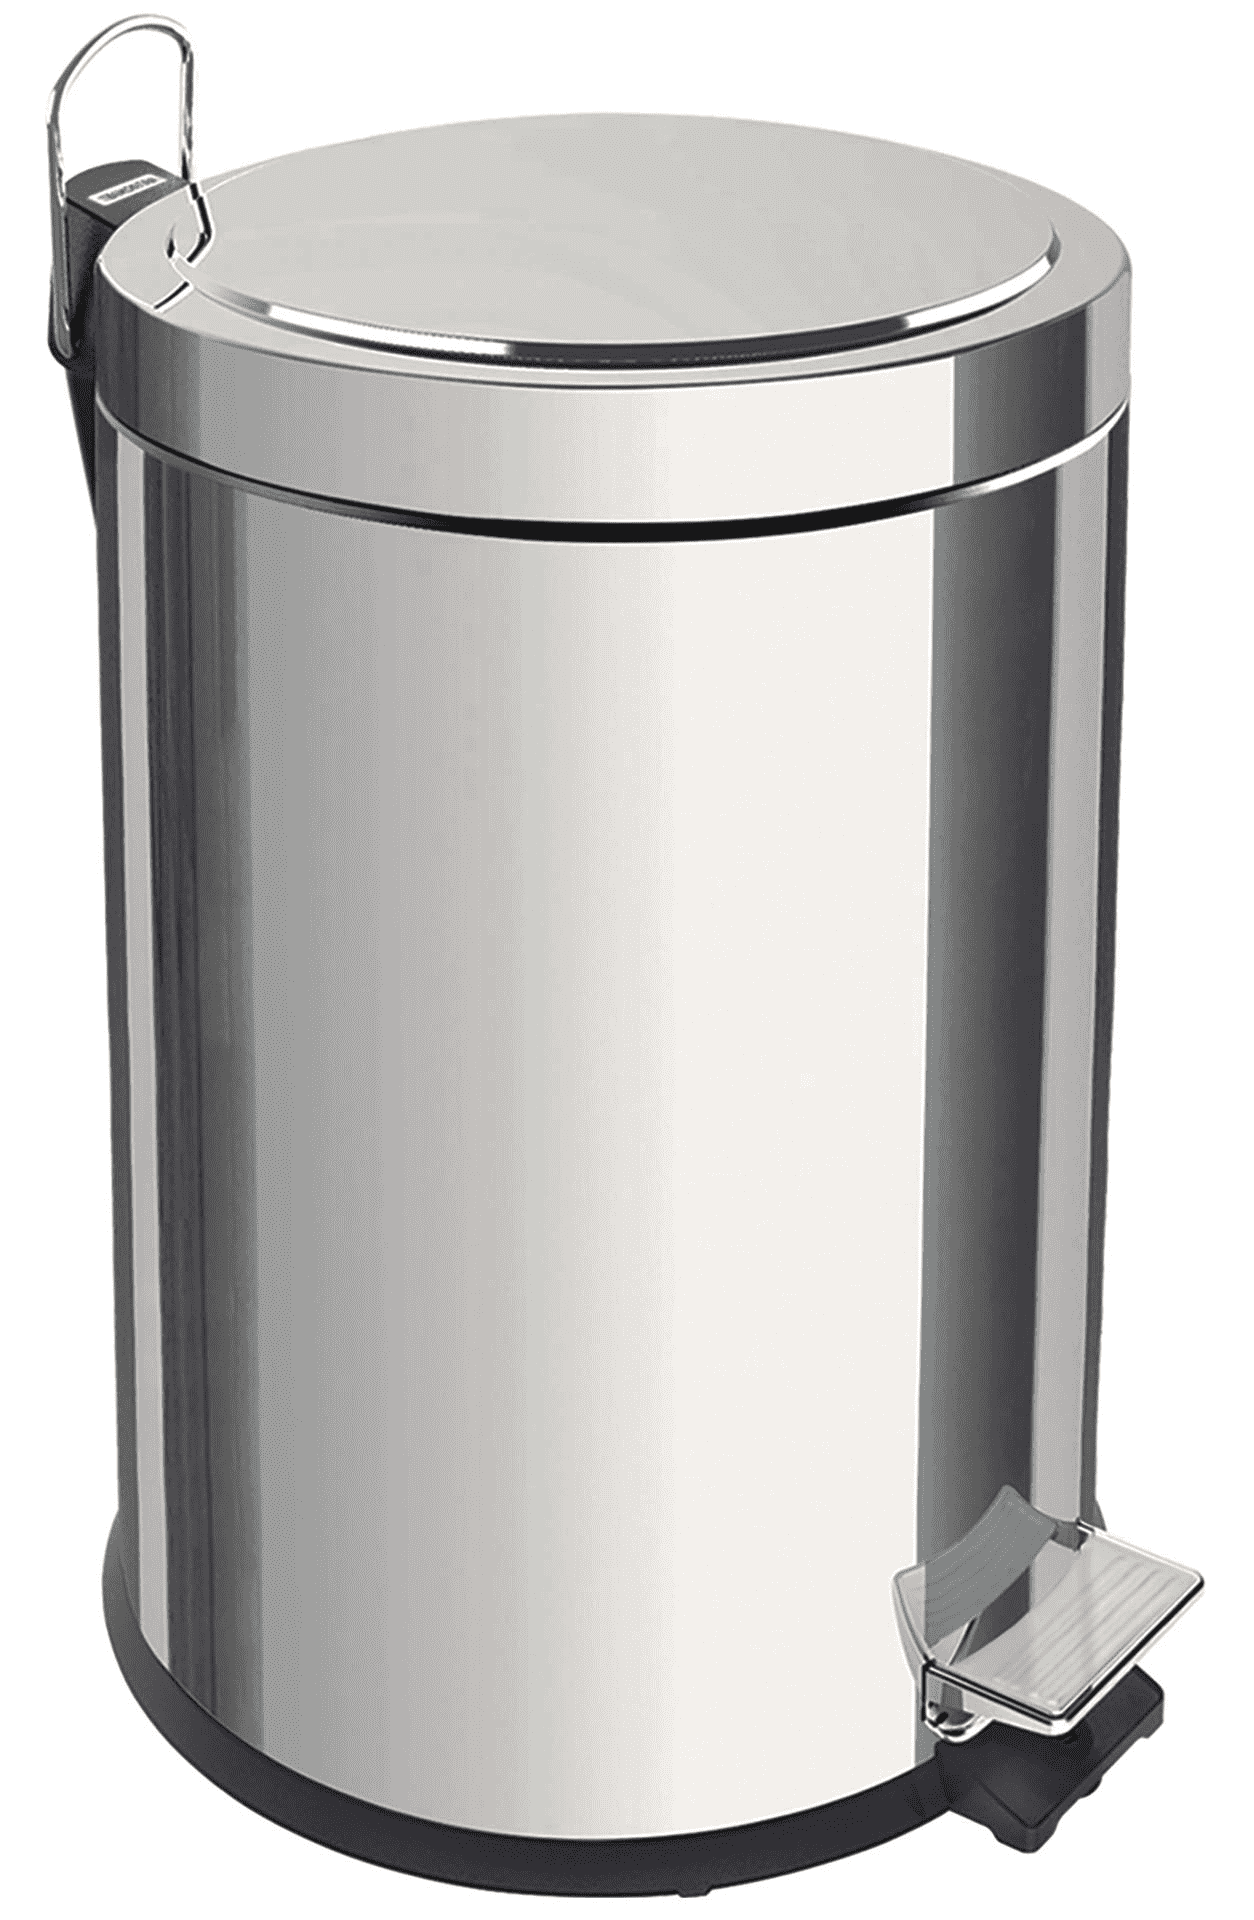 LIXEIRA INOX COM PEDAL E BALDE INTERNO 5L - TRAMONTINA